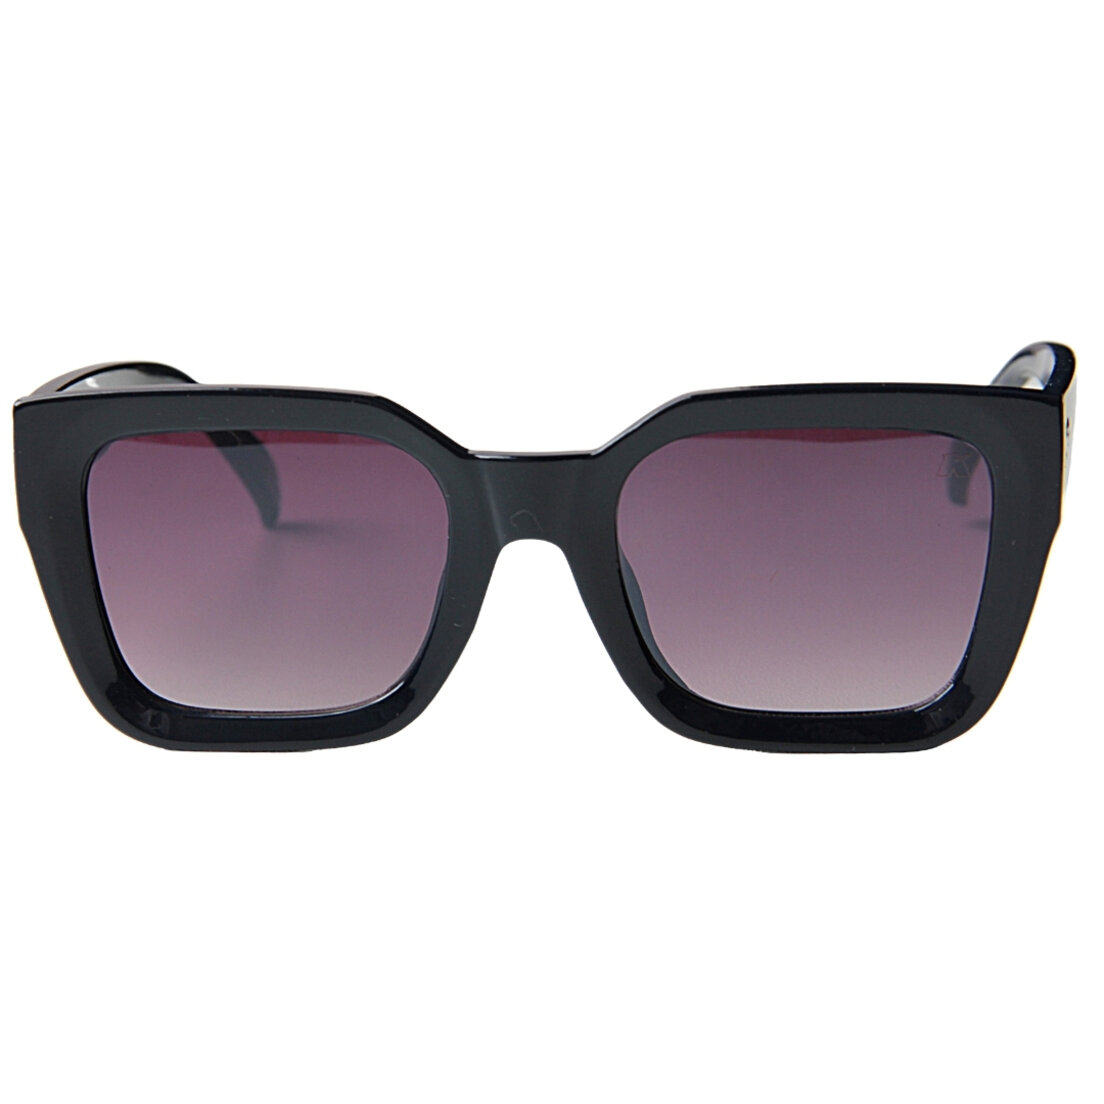 OUTLET - Óculos de Sol Khatto Square Ully